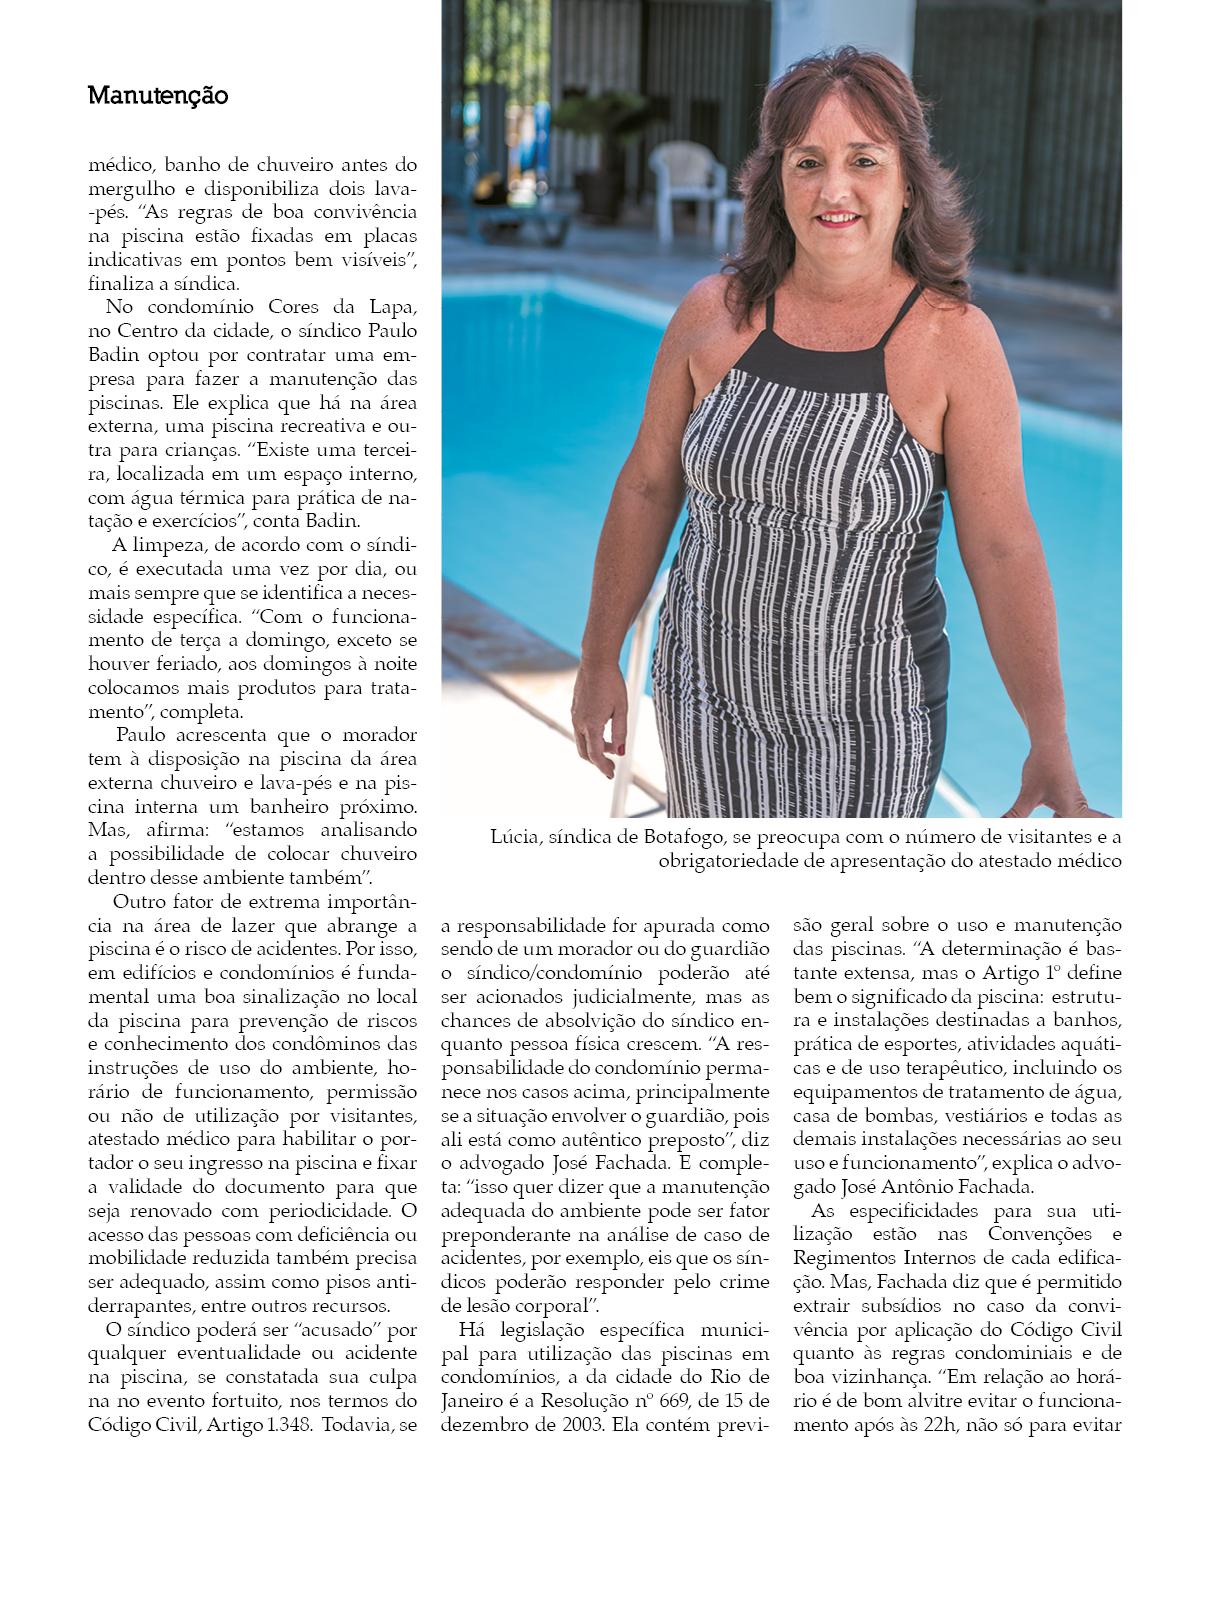 Revista Síndico_ed 242_58